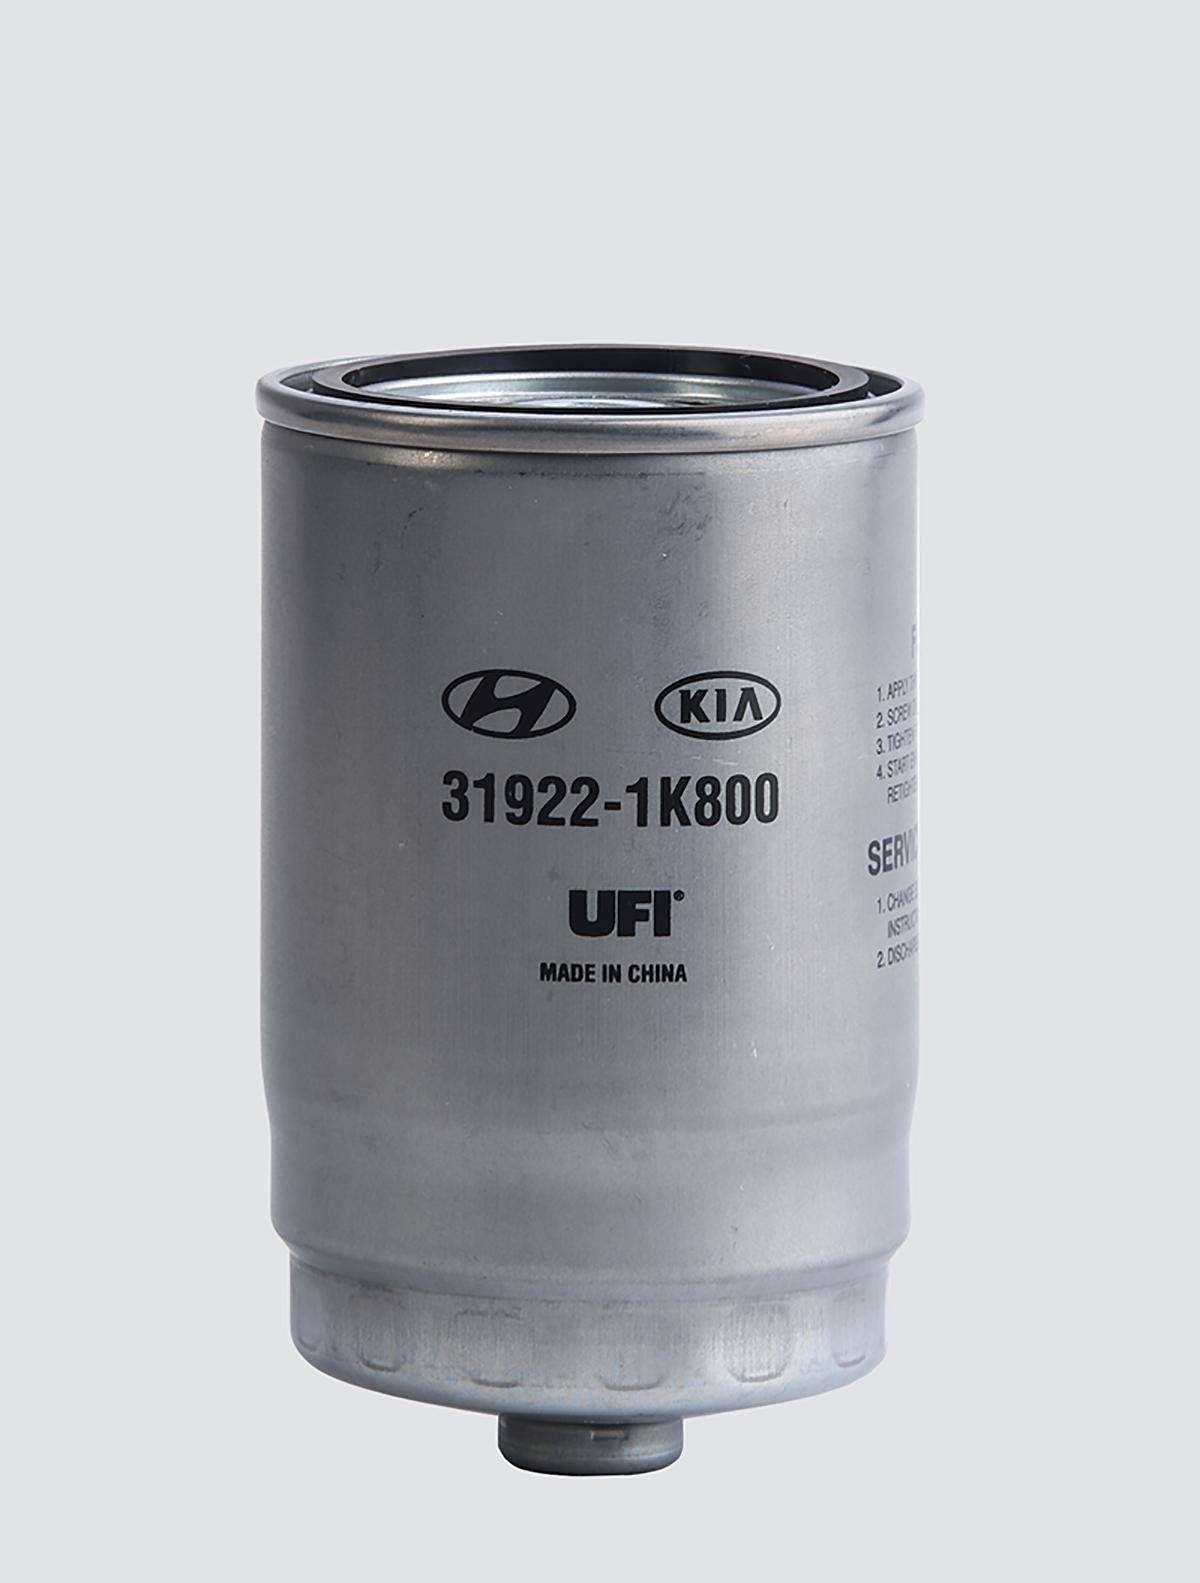 Ufi Filters 24.009.00 Fuel Filter